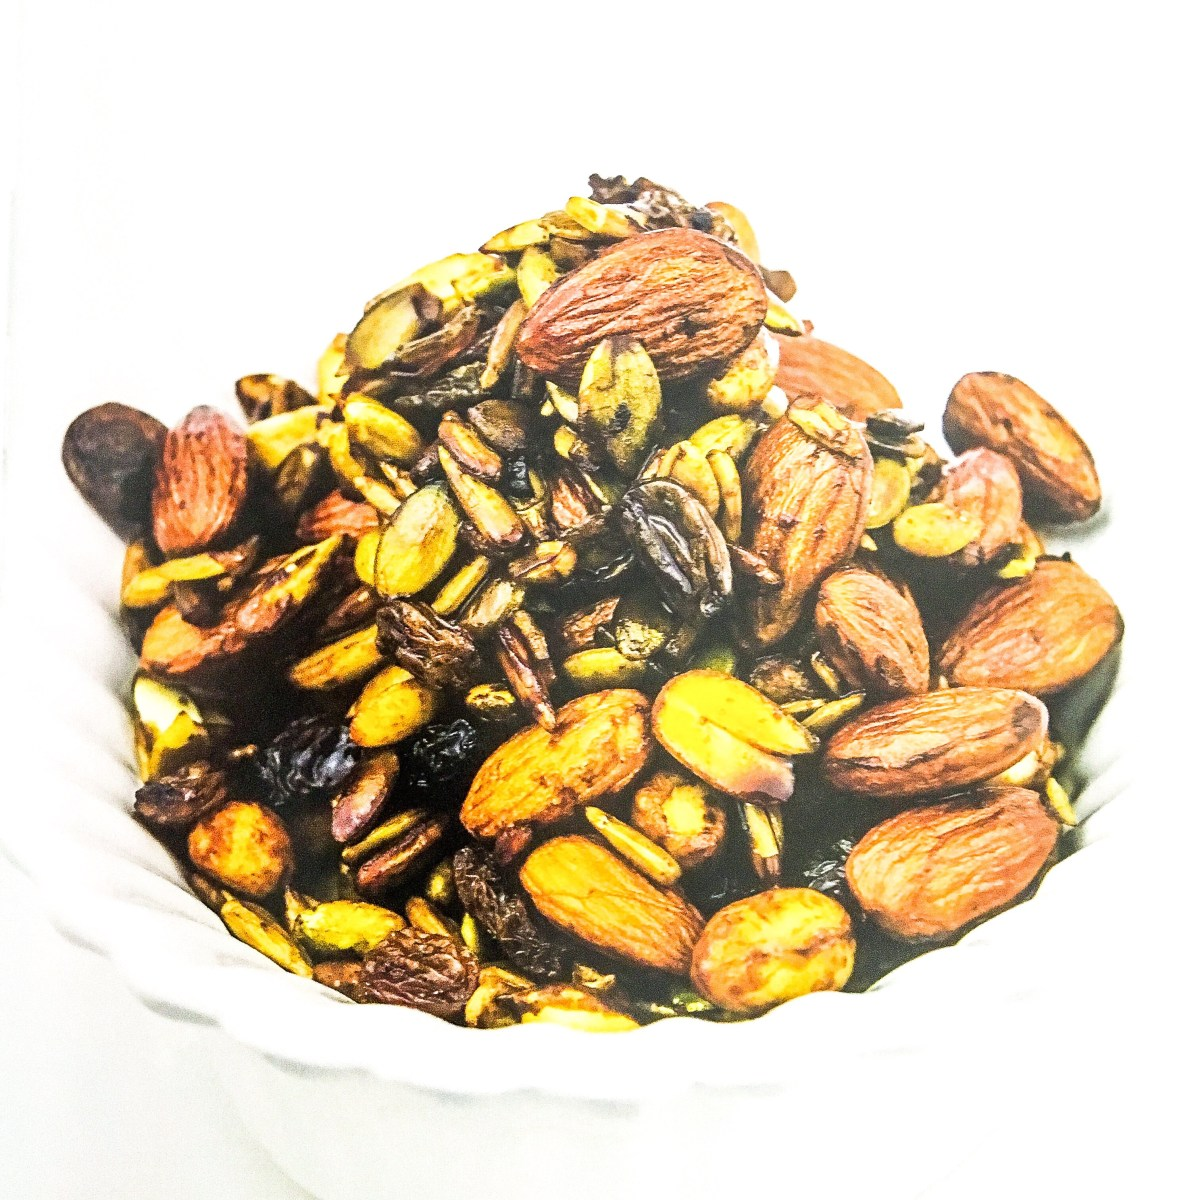 Recipe: Tamari Nuts and Seeds